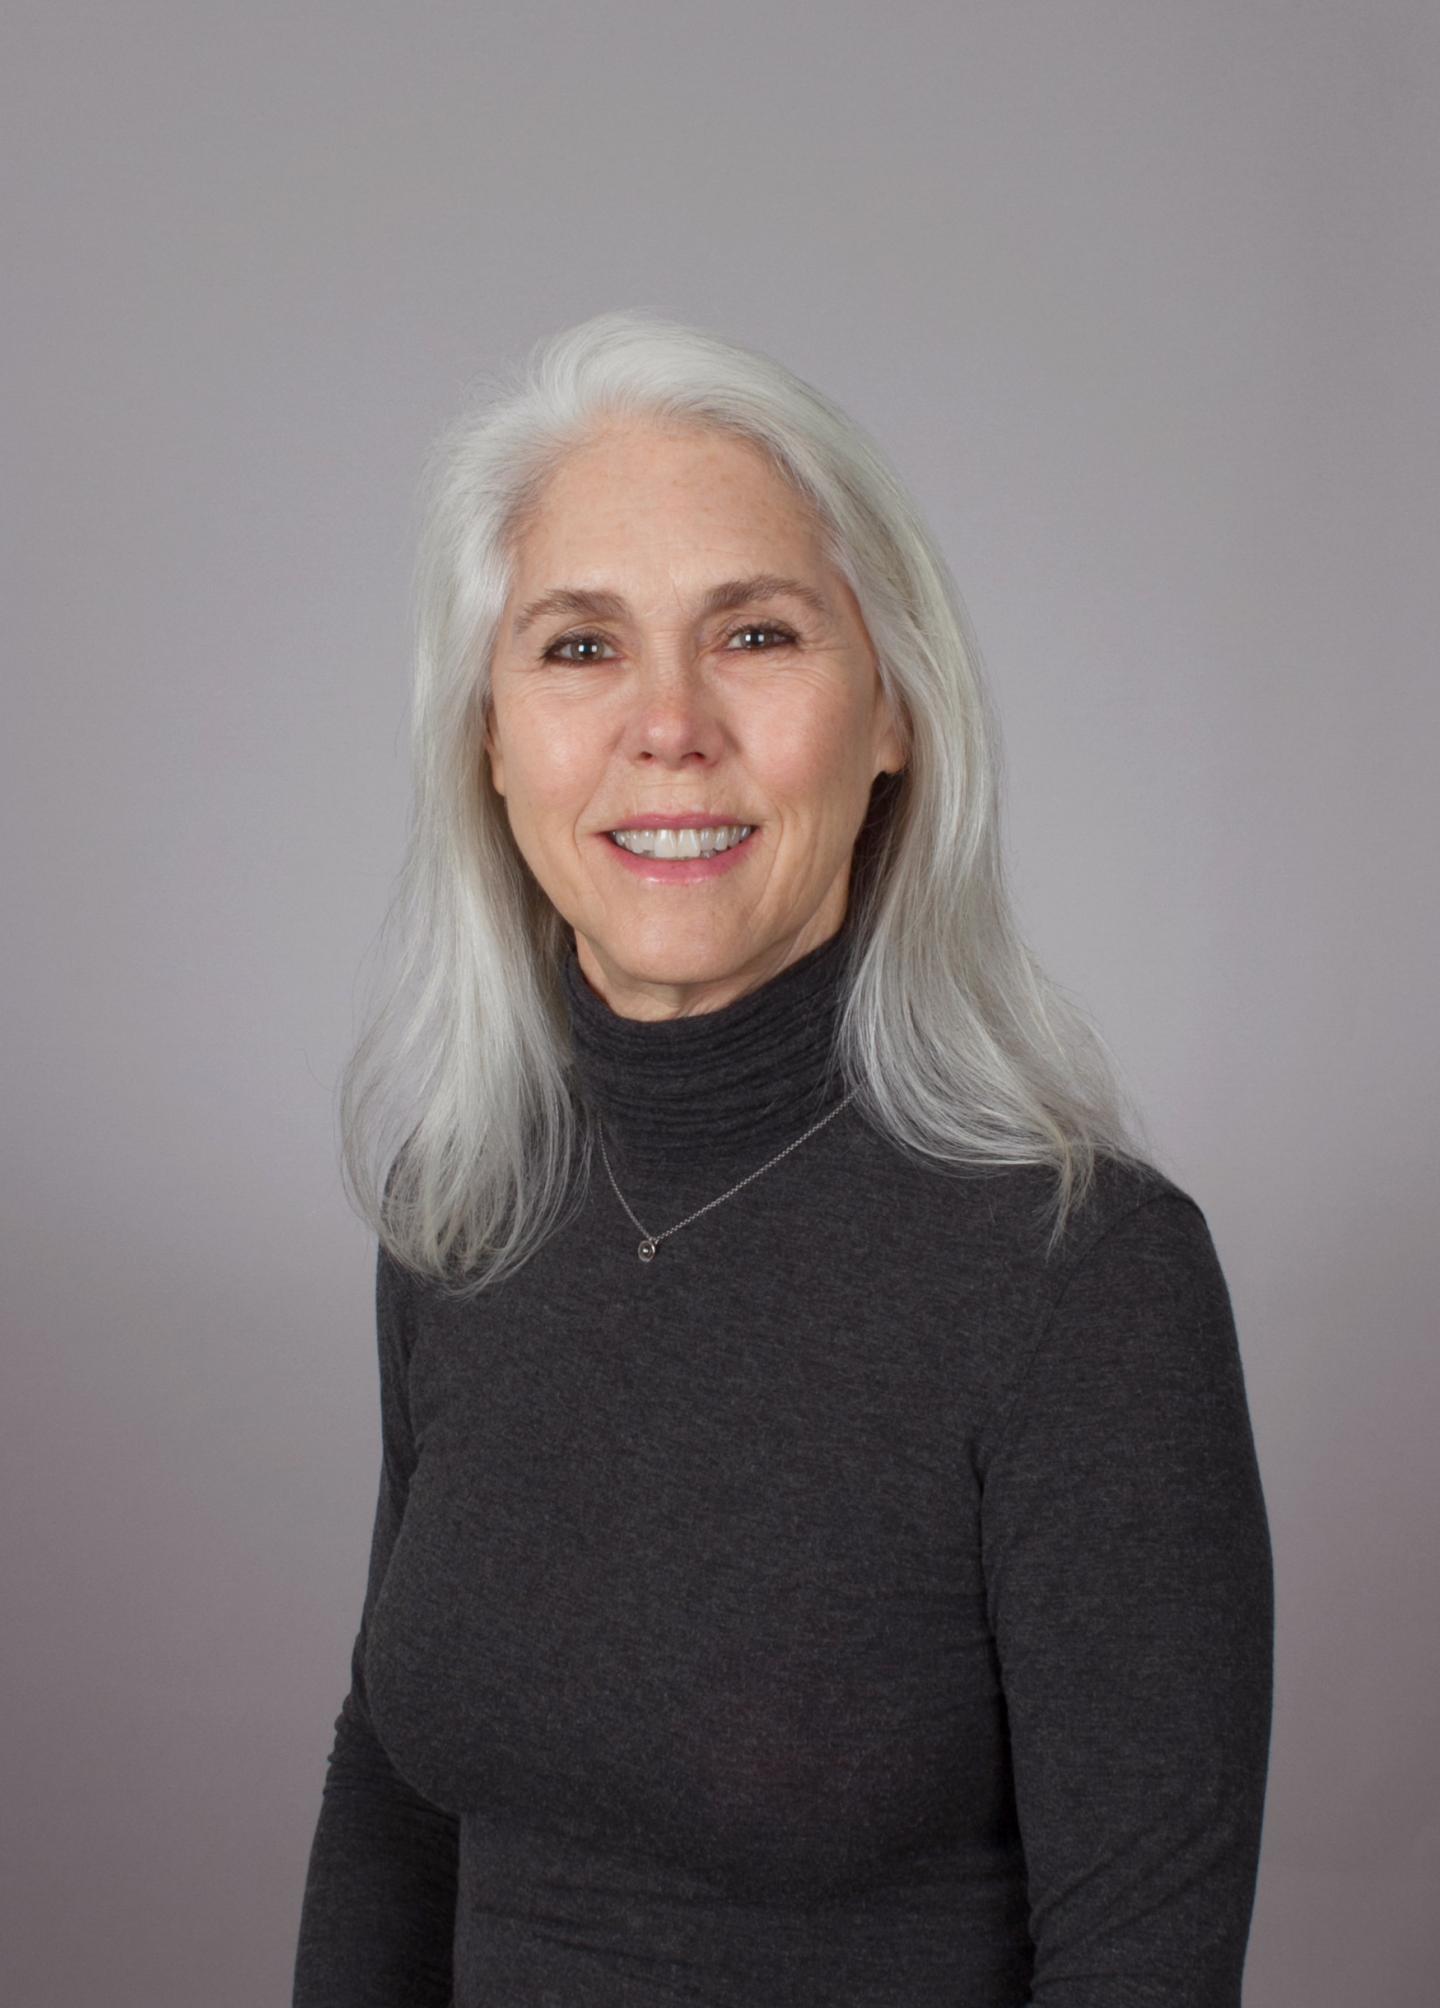 Dr. Alicia McDonough, University of Southern California - Health Sciences